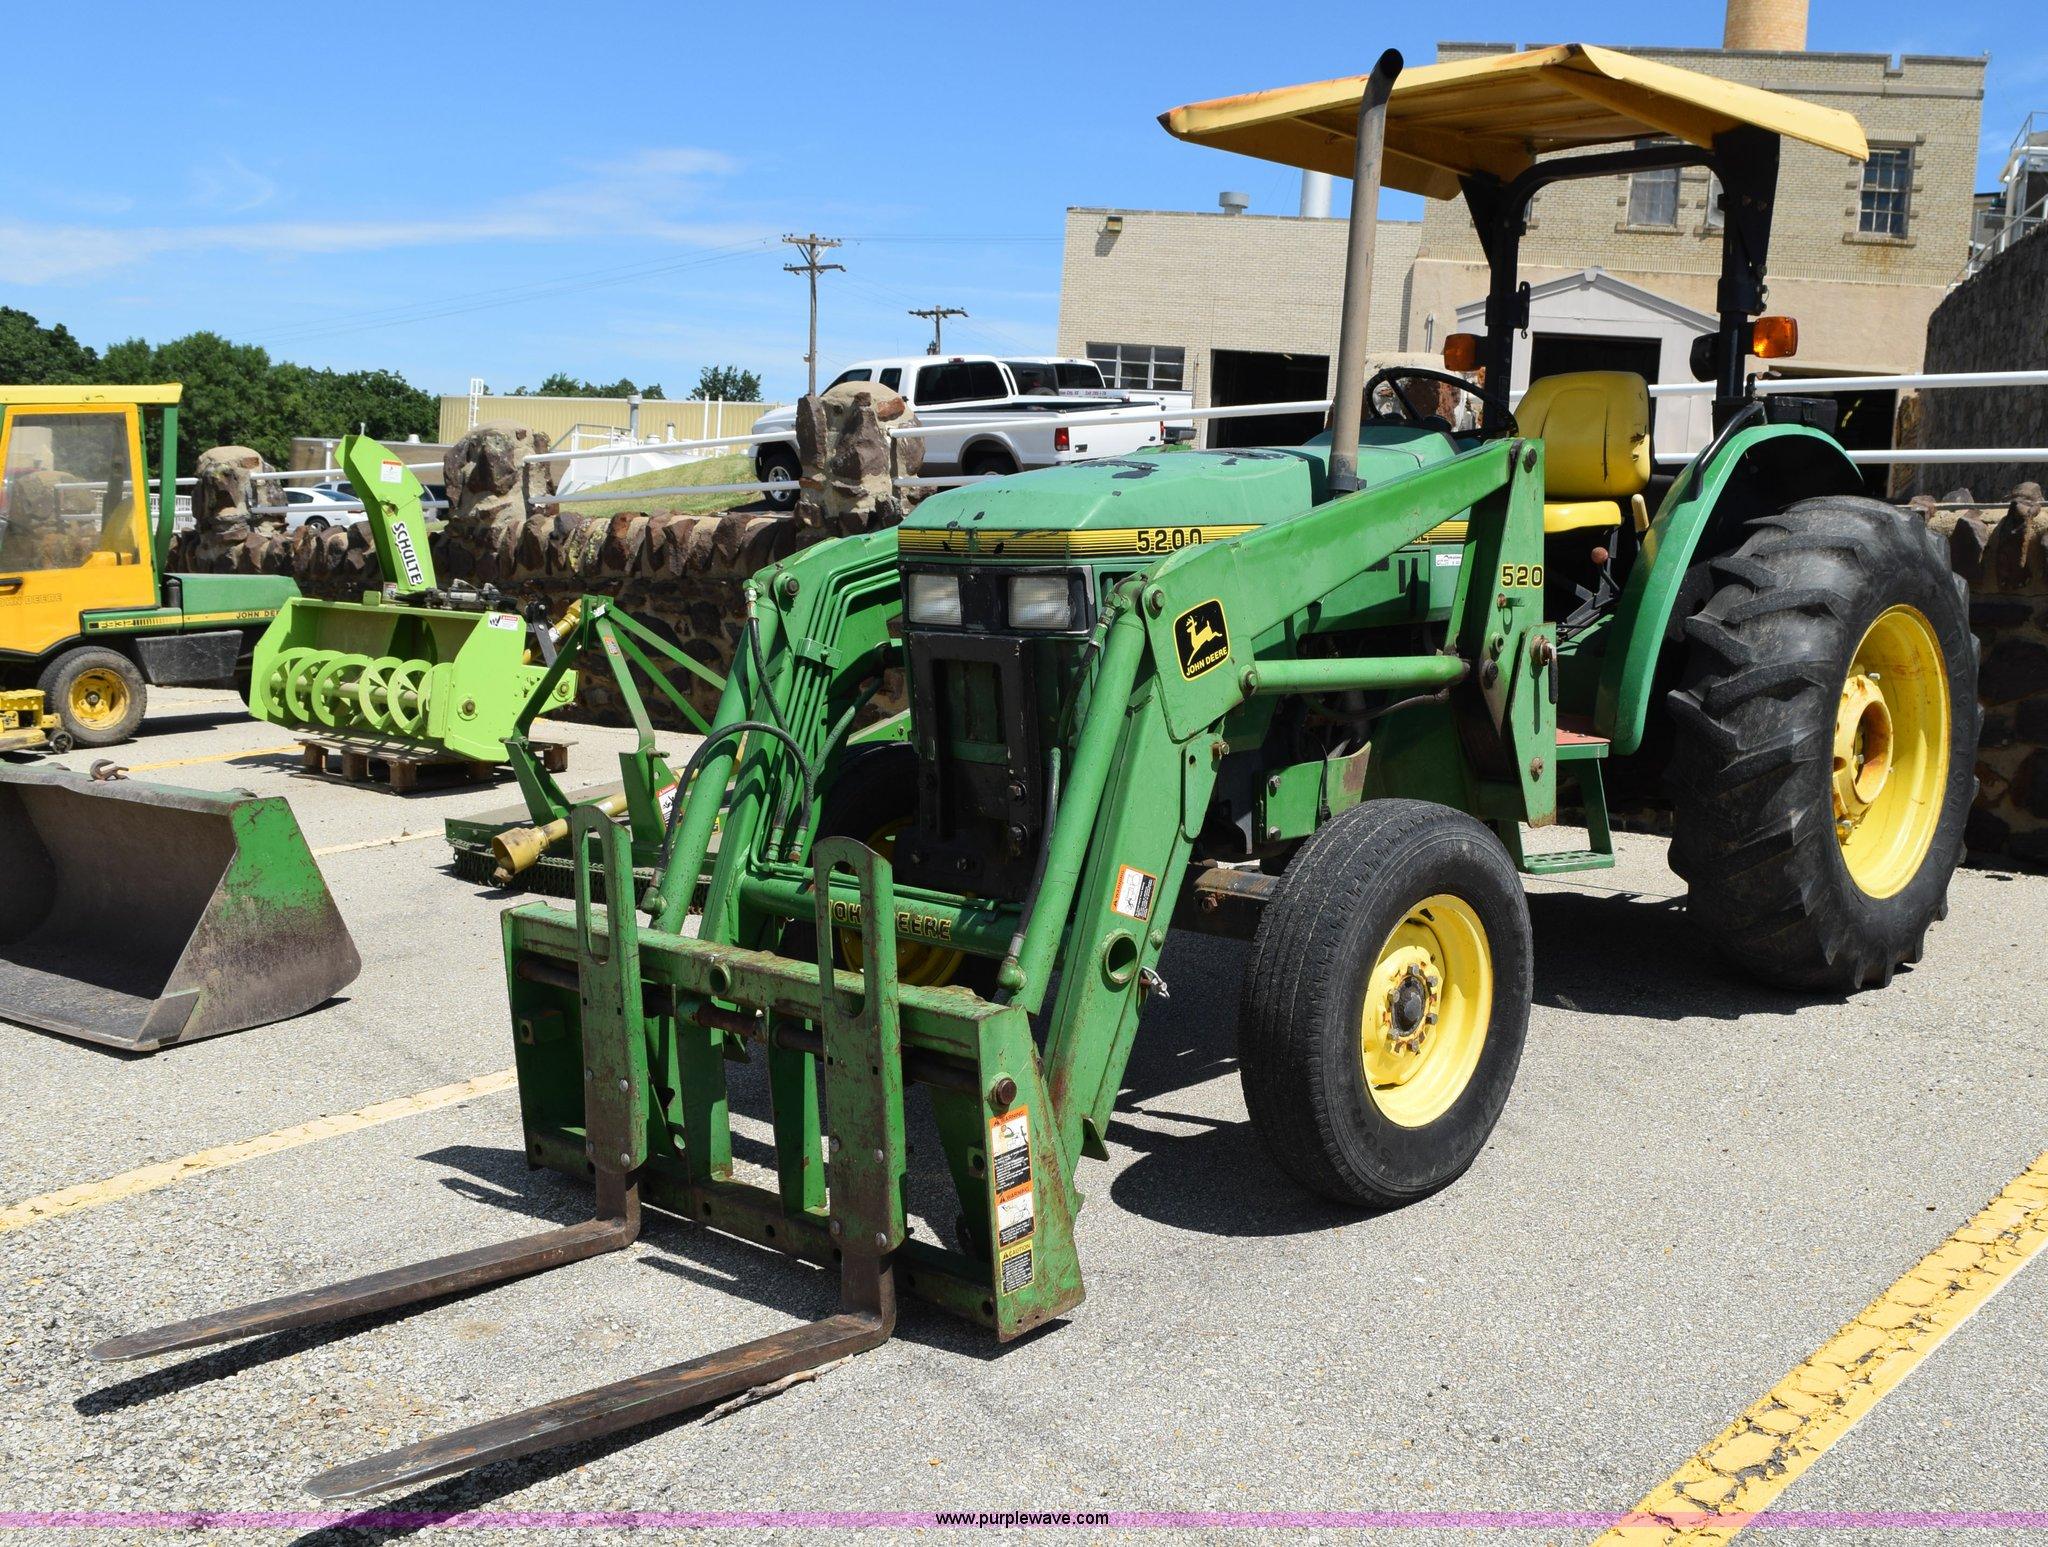 John Deere 5200 Tractor Item Bi9424 Sold August 4 Gover. Bi9424 For Item John Deere 5200 Tractor. John Deere. John Deere 5200 Tractor Wiring At Scoala.co